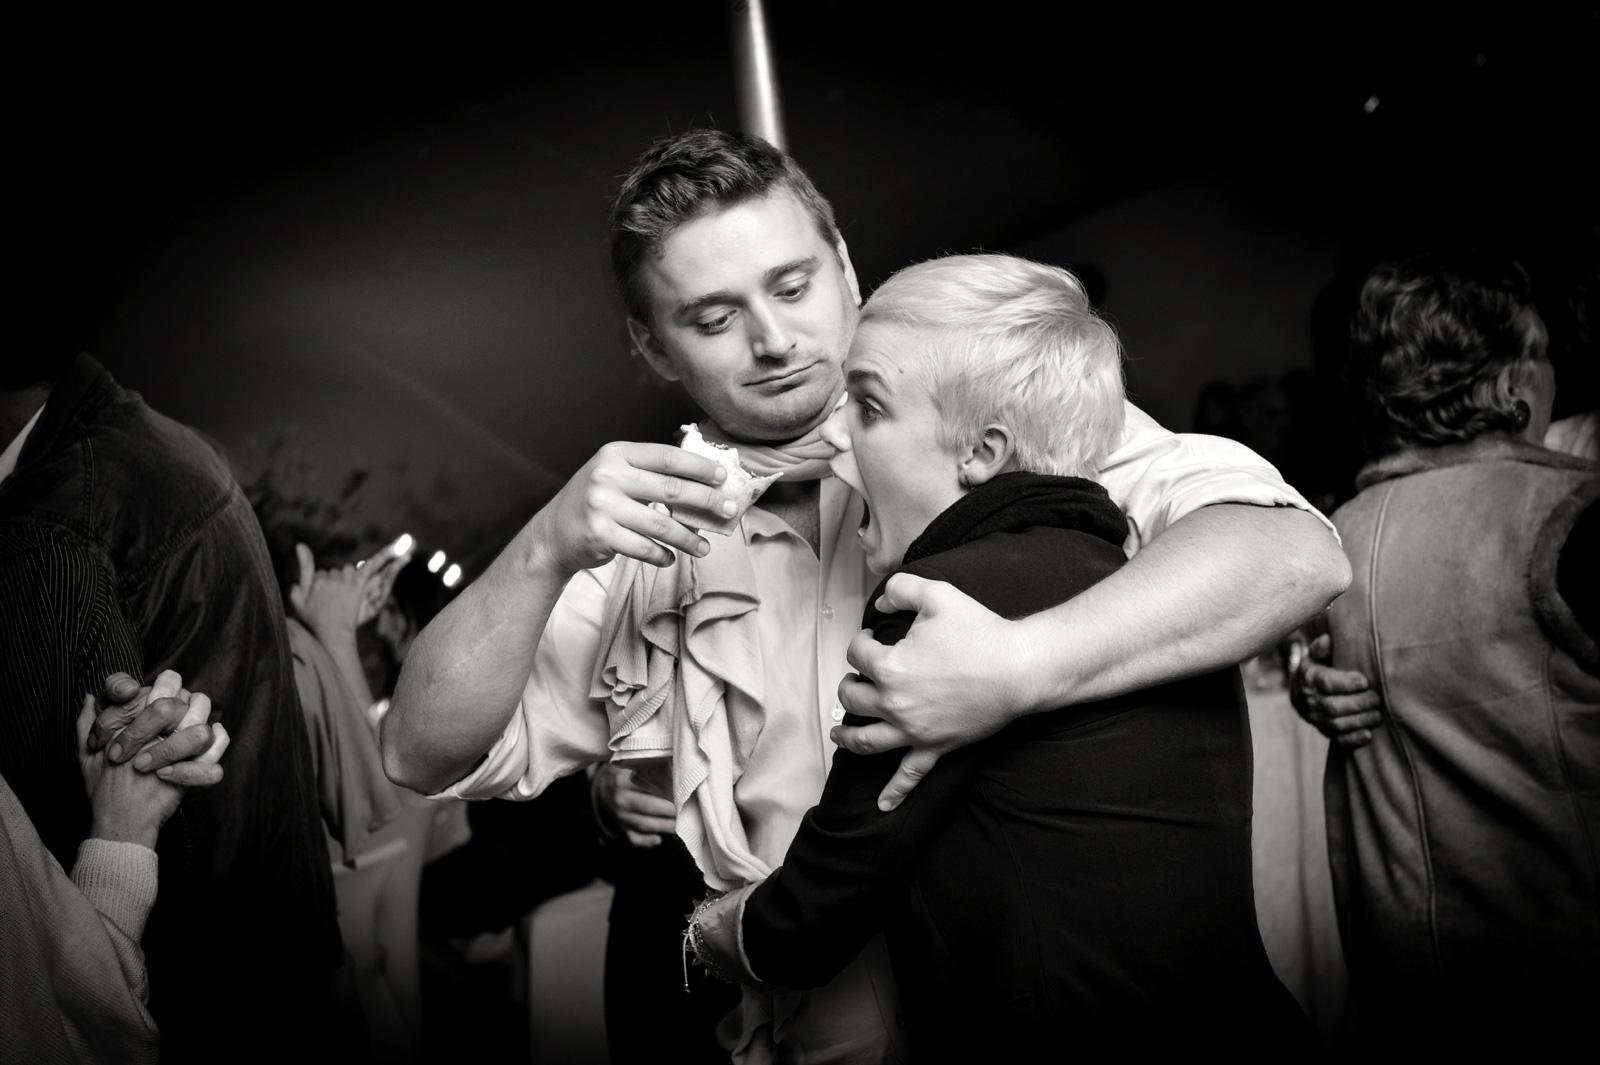 drunk at a wedding